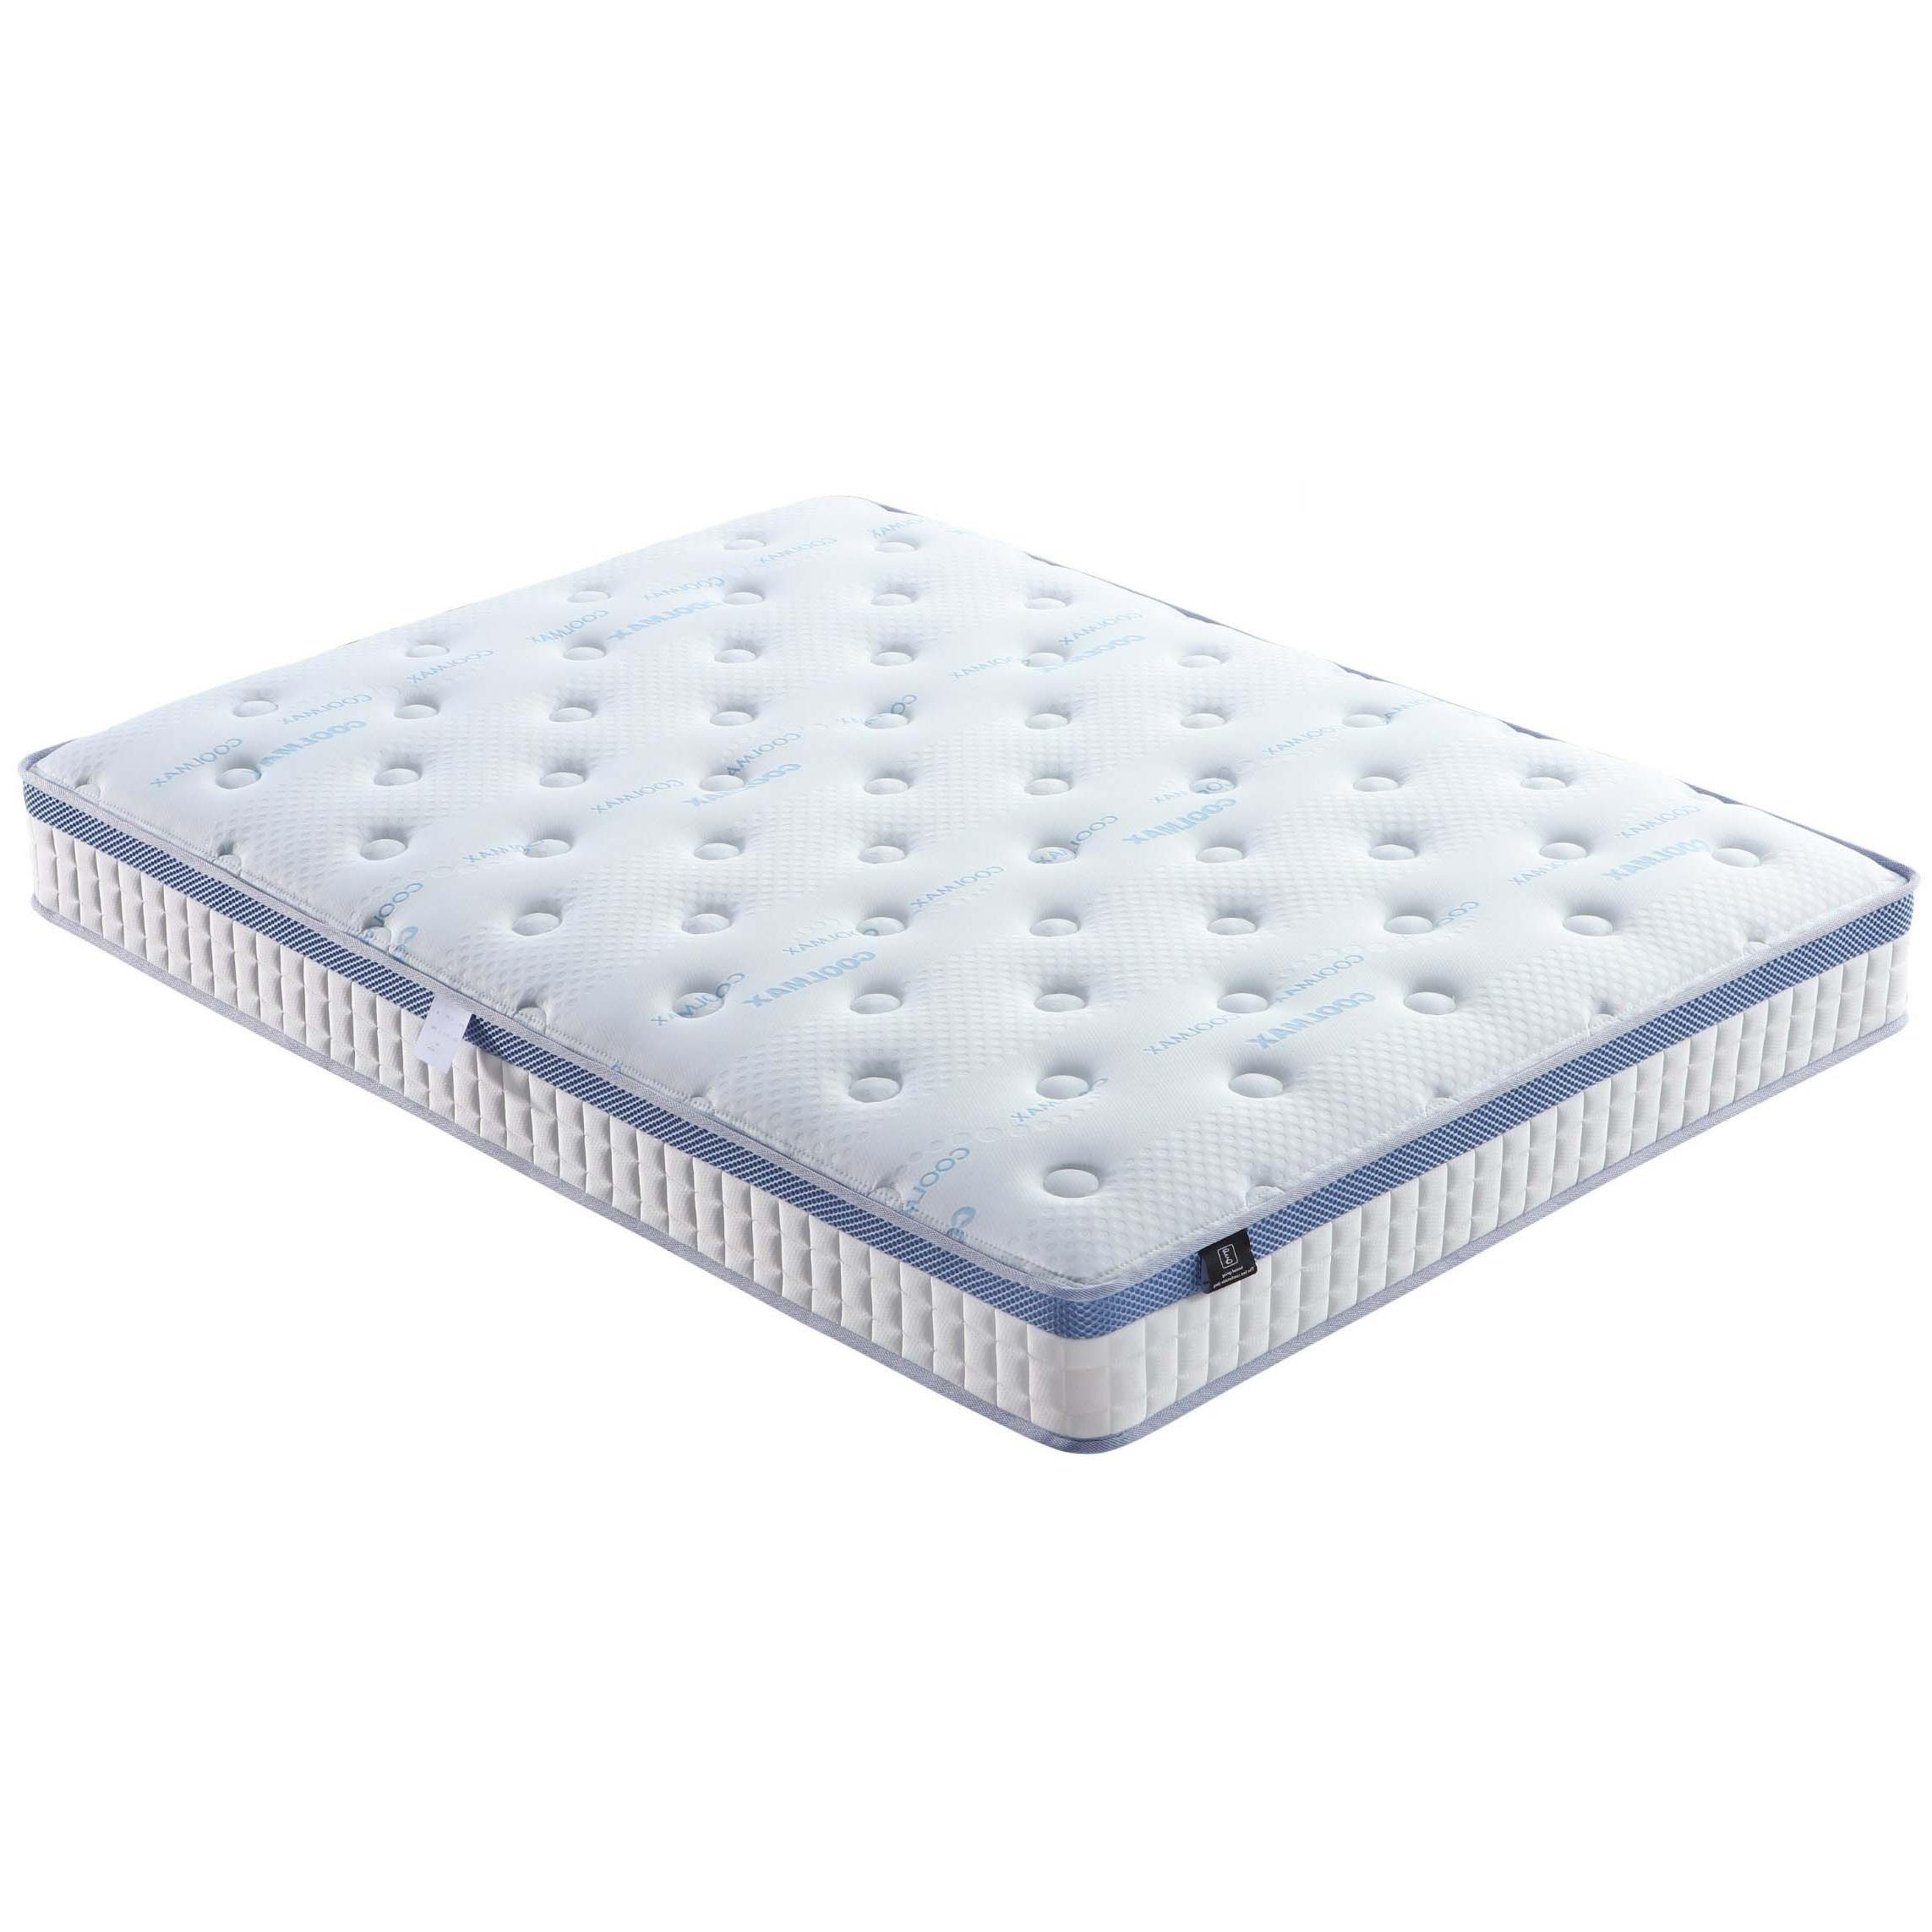 20cm Thickness Soft Convoluted Foam Euro Top Bonnel Spring Mattress - Jozy Mattress   Jozy.net